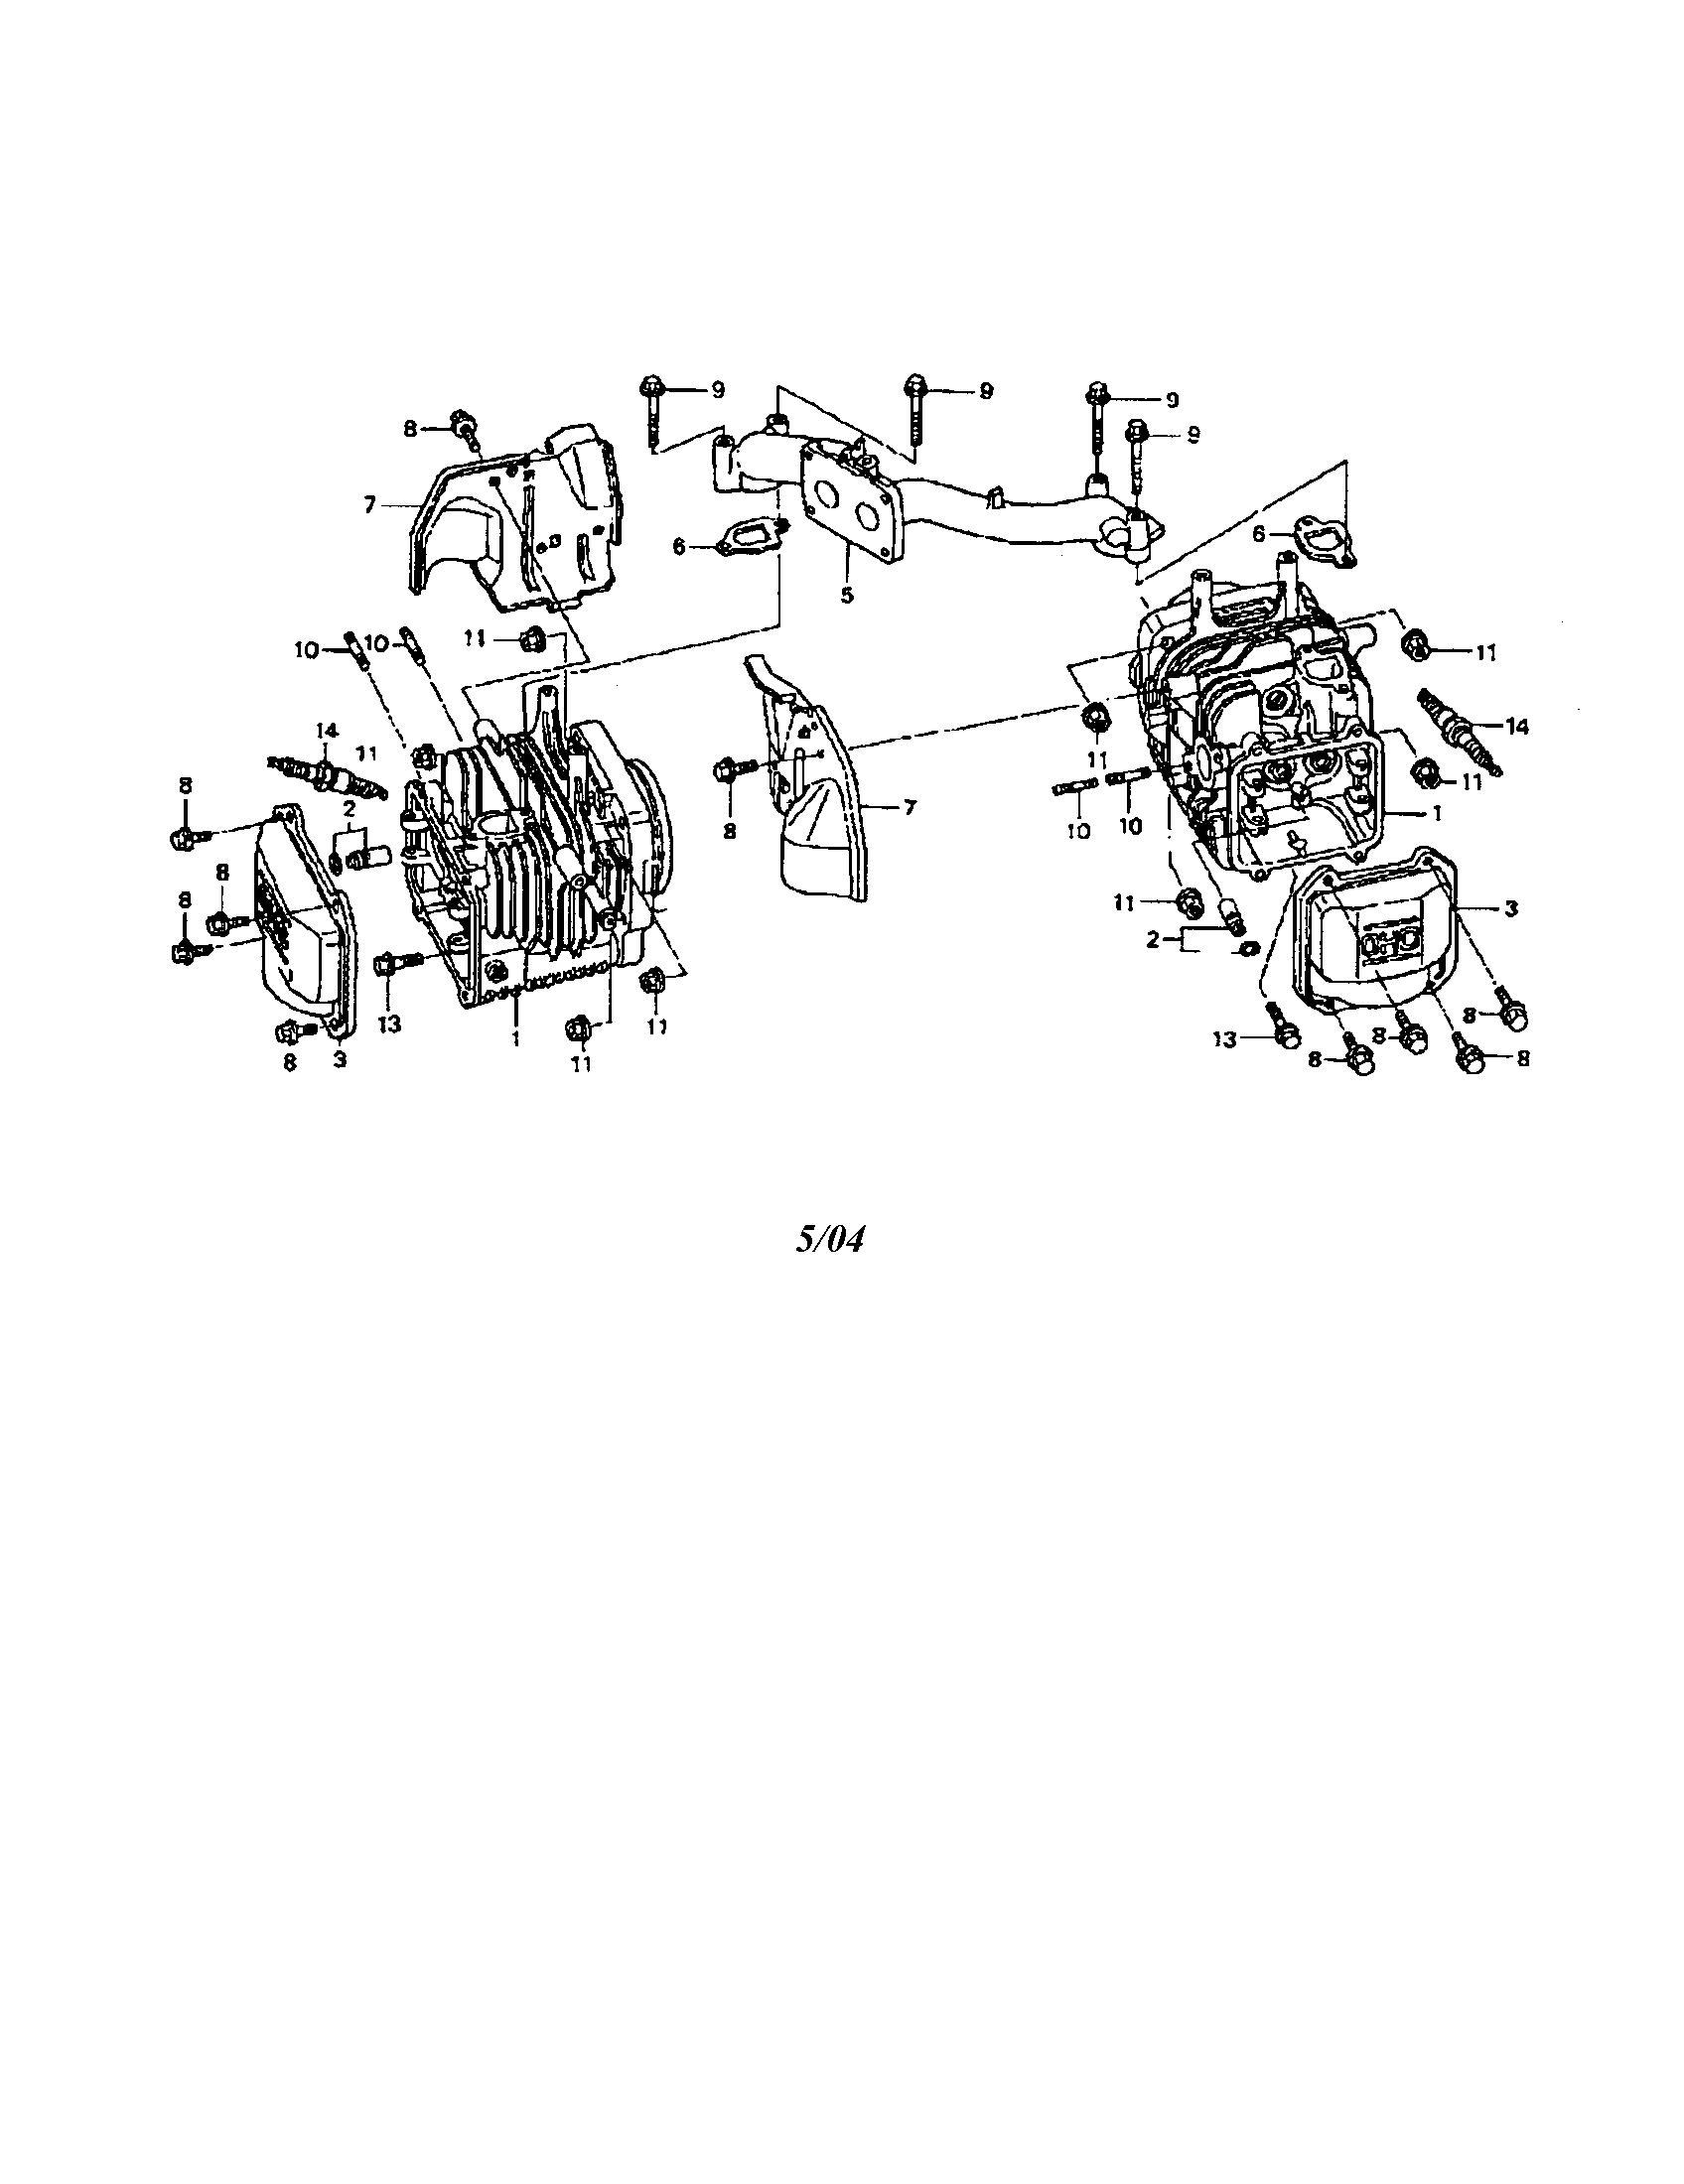 Honda Gcv 190 Engine Parts Diagram, Honda, Free Engine